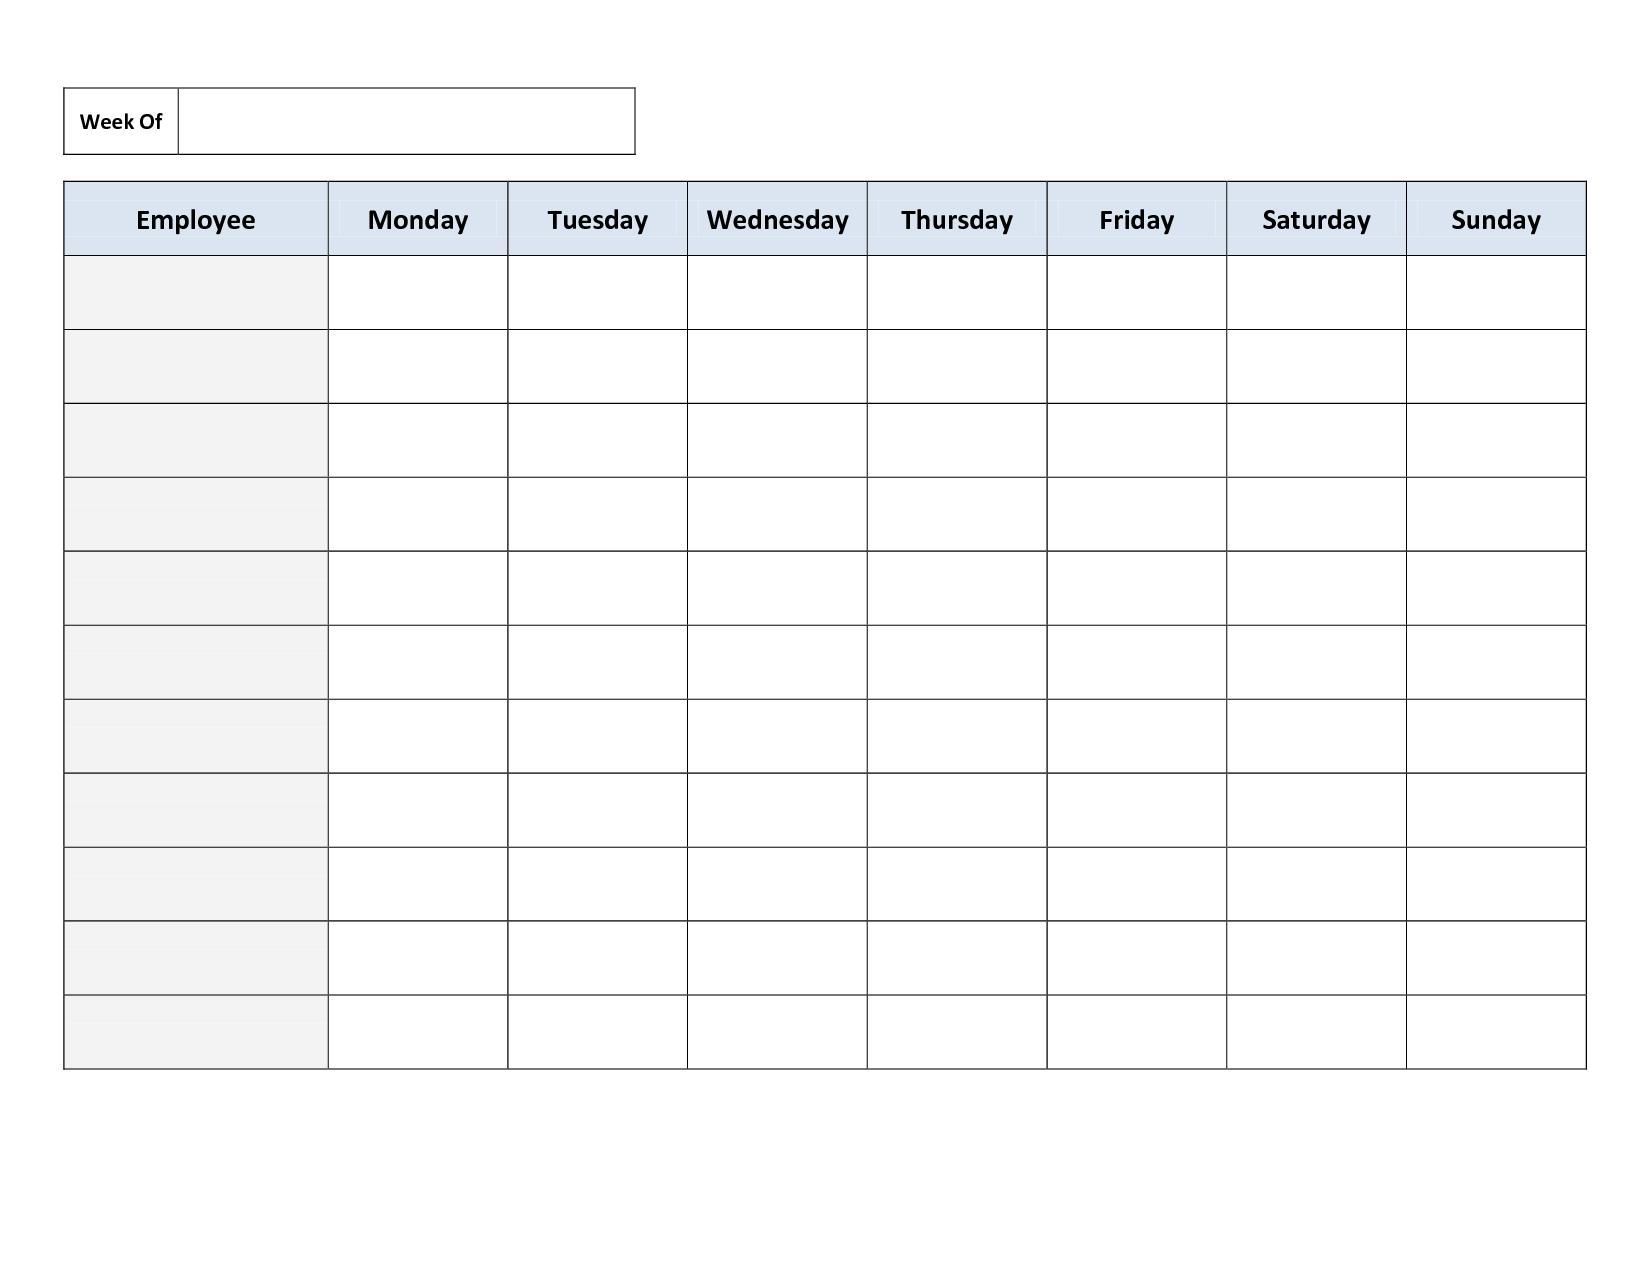 Free Printable Work Schedules | Weekly Employee Work Schedule